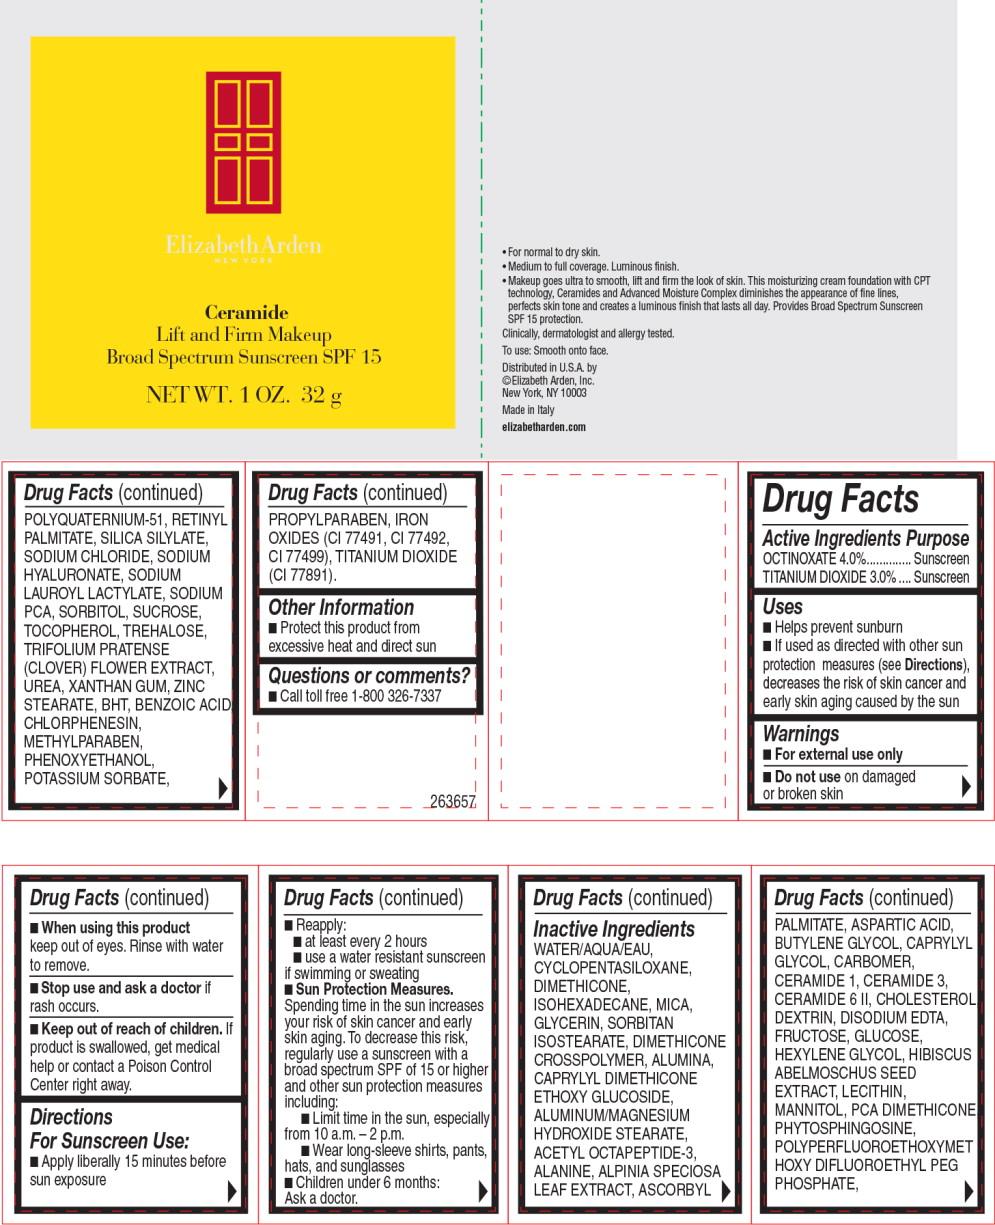 Ceramide Lift And Firm Makeup Broad Spectrum Sunscreen Spf 15 Warm Honey (Octinoxate And Titanium Dioxide) Cream [Elizabeth Arden, Inc]